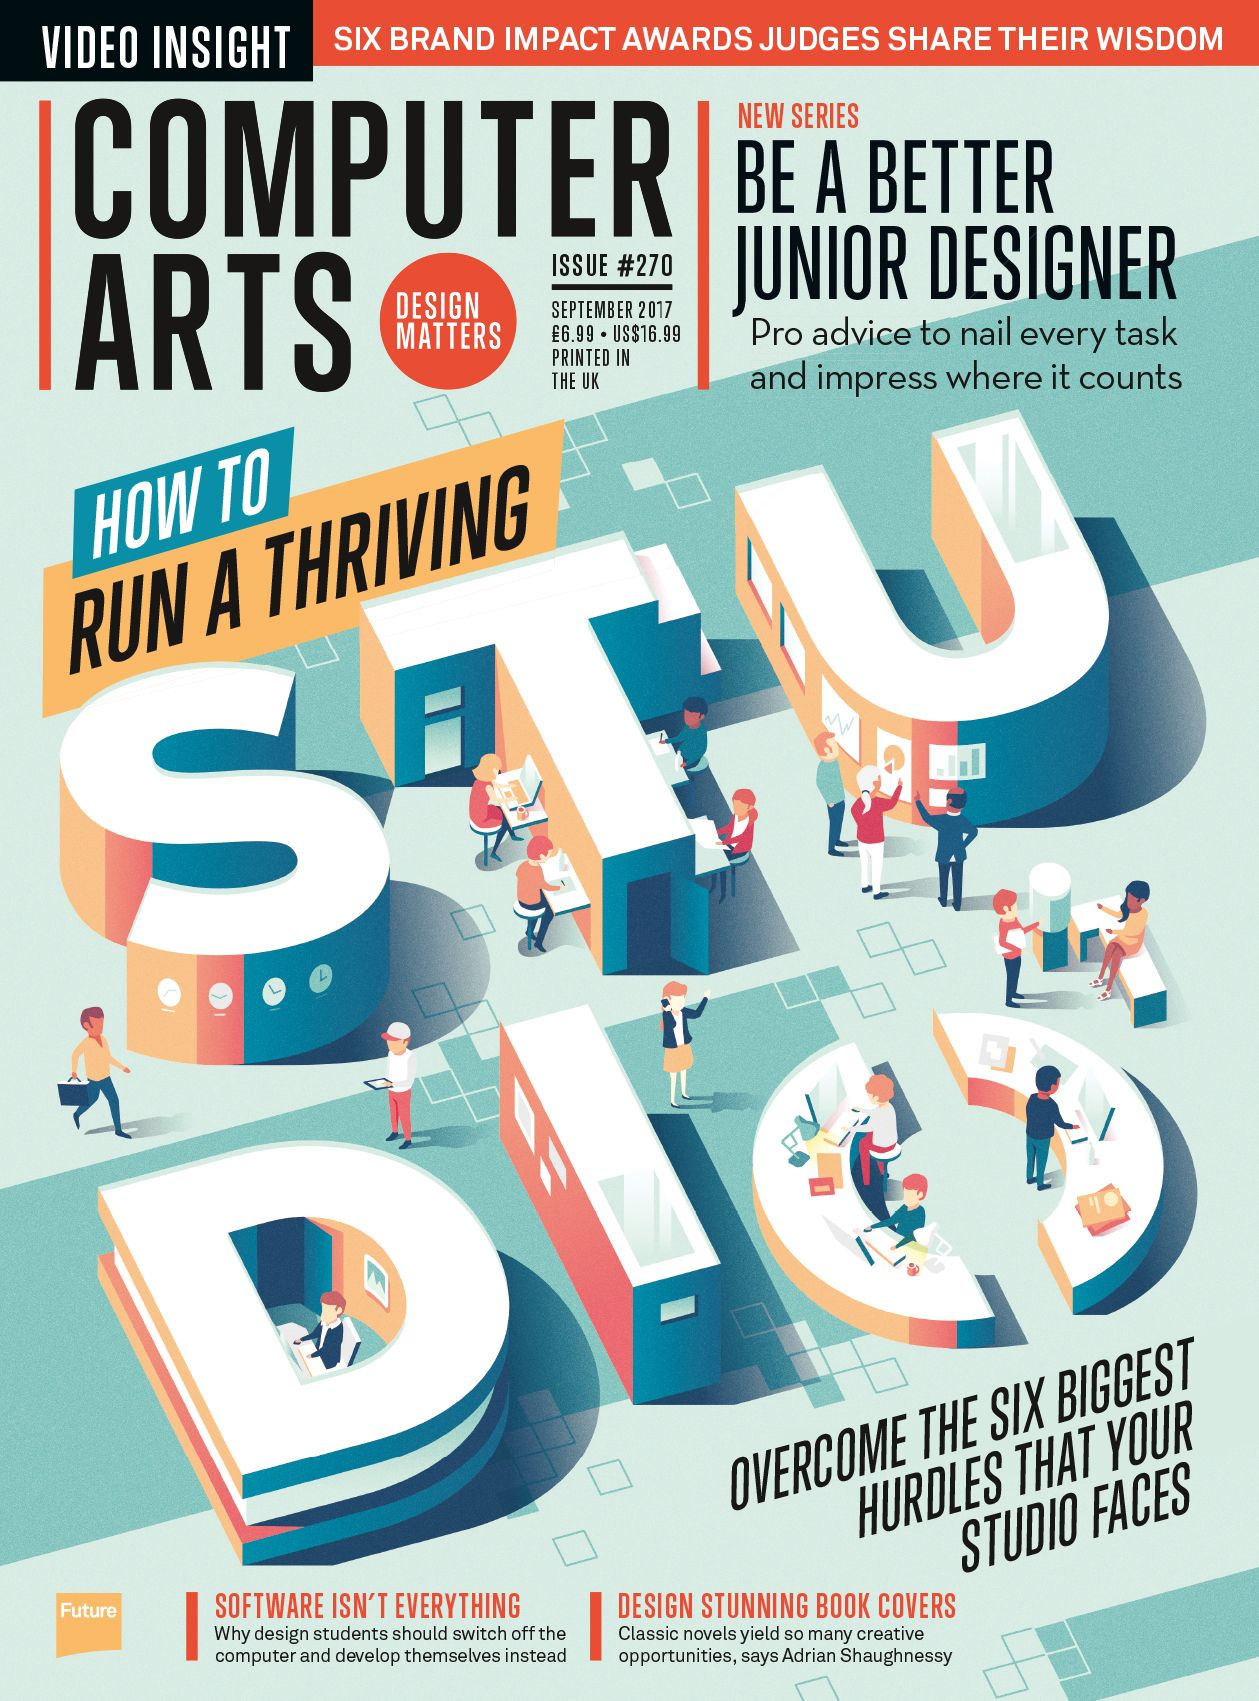 Advertising-Infographics-Run-a-thriving-design-studio-with-the Advertising Infographics : Run a thriving design studio with the new Computer Arts